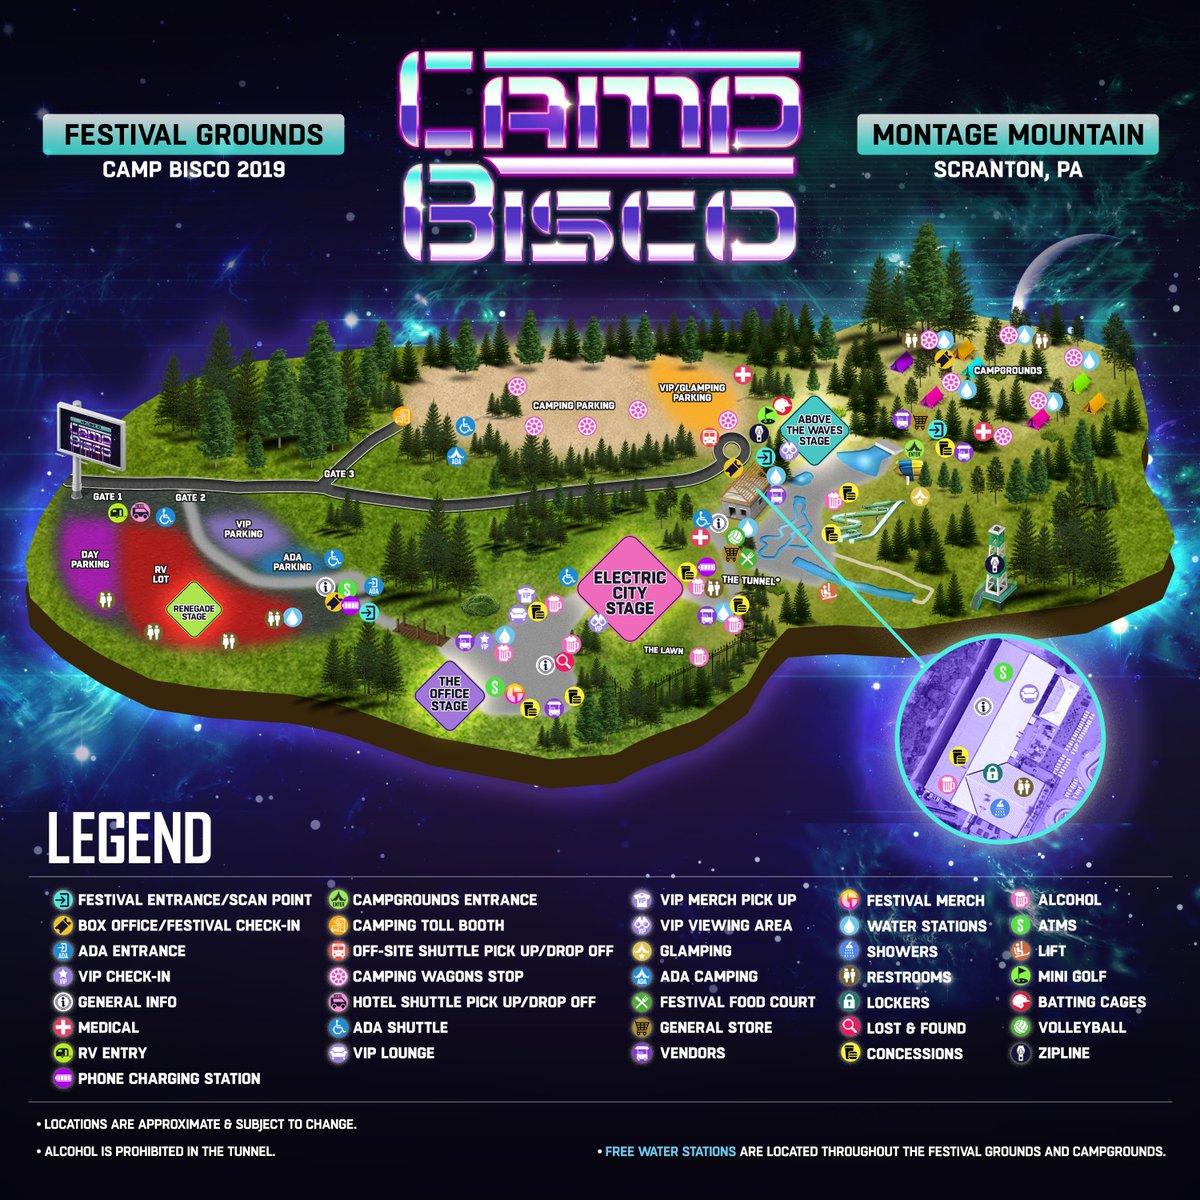 Camp Bisco 2020